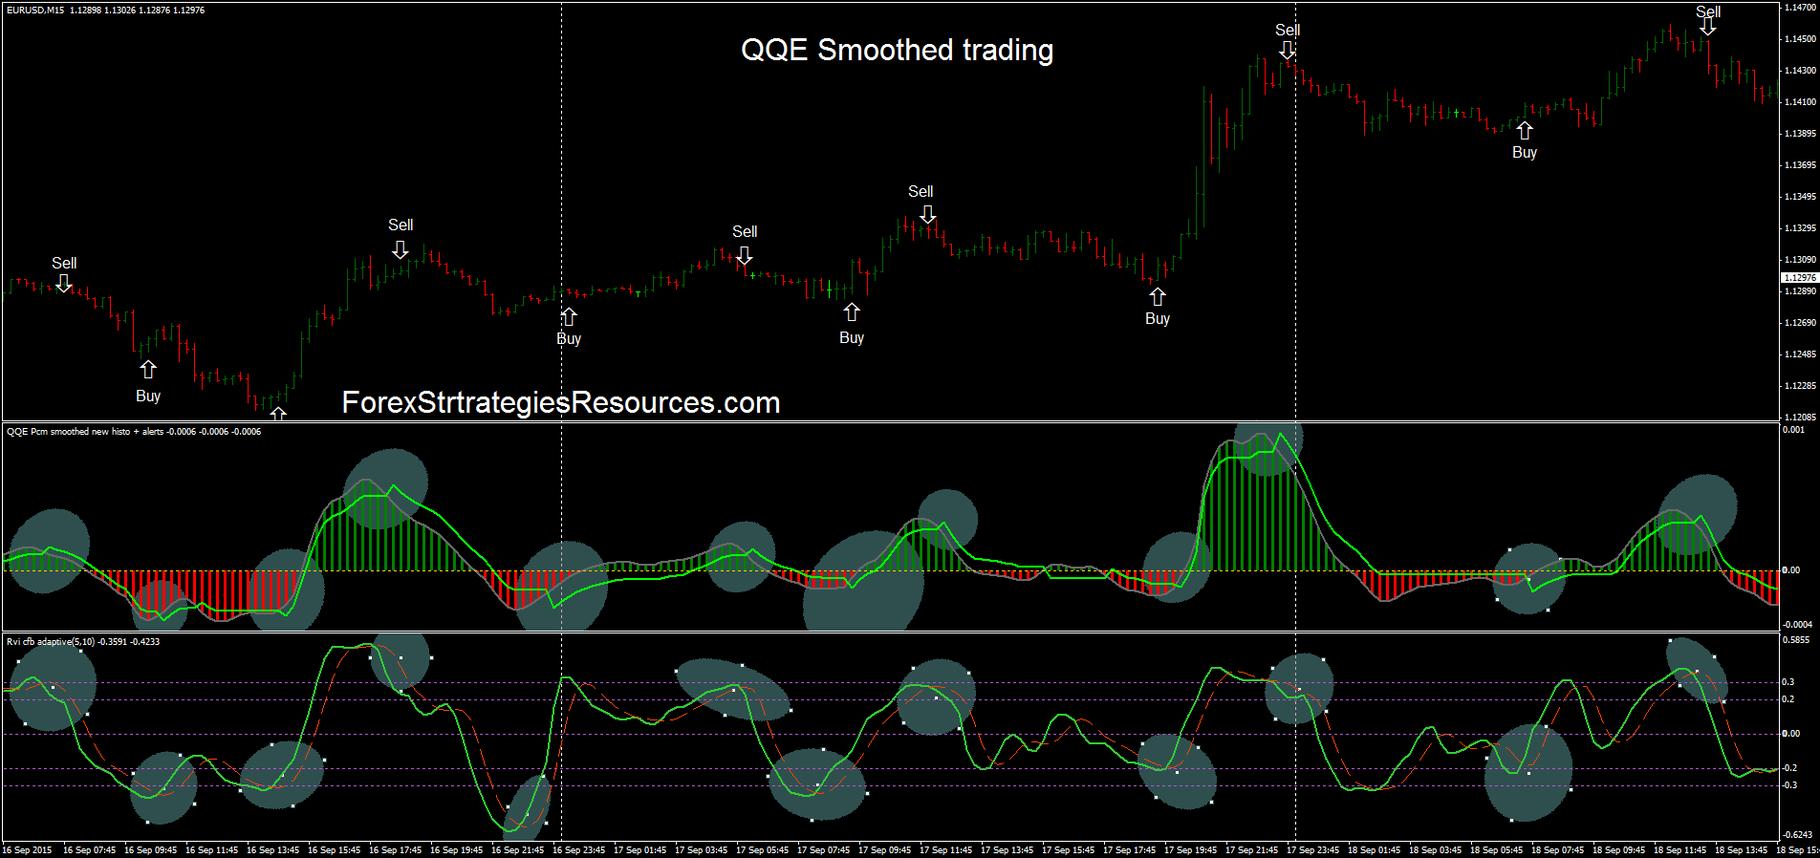 Qqe indicator trading system